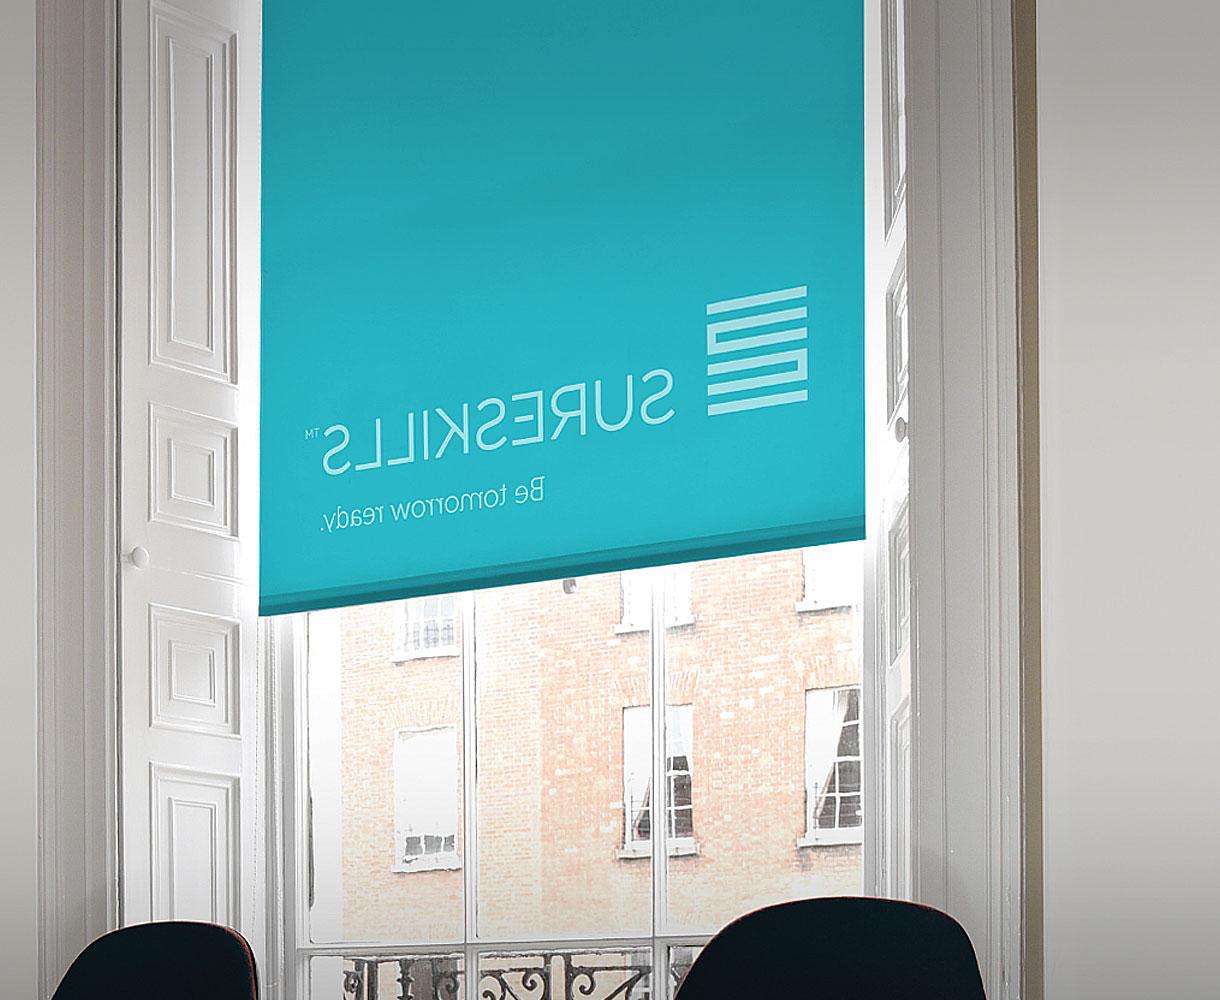 Sureskills Brand Identity Development office fitout refit